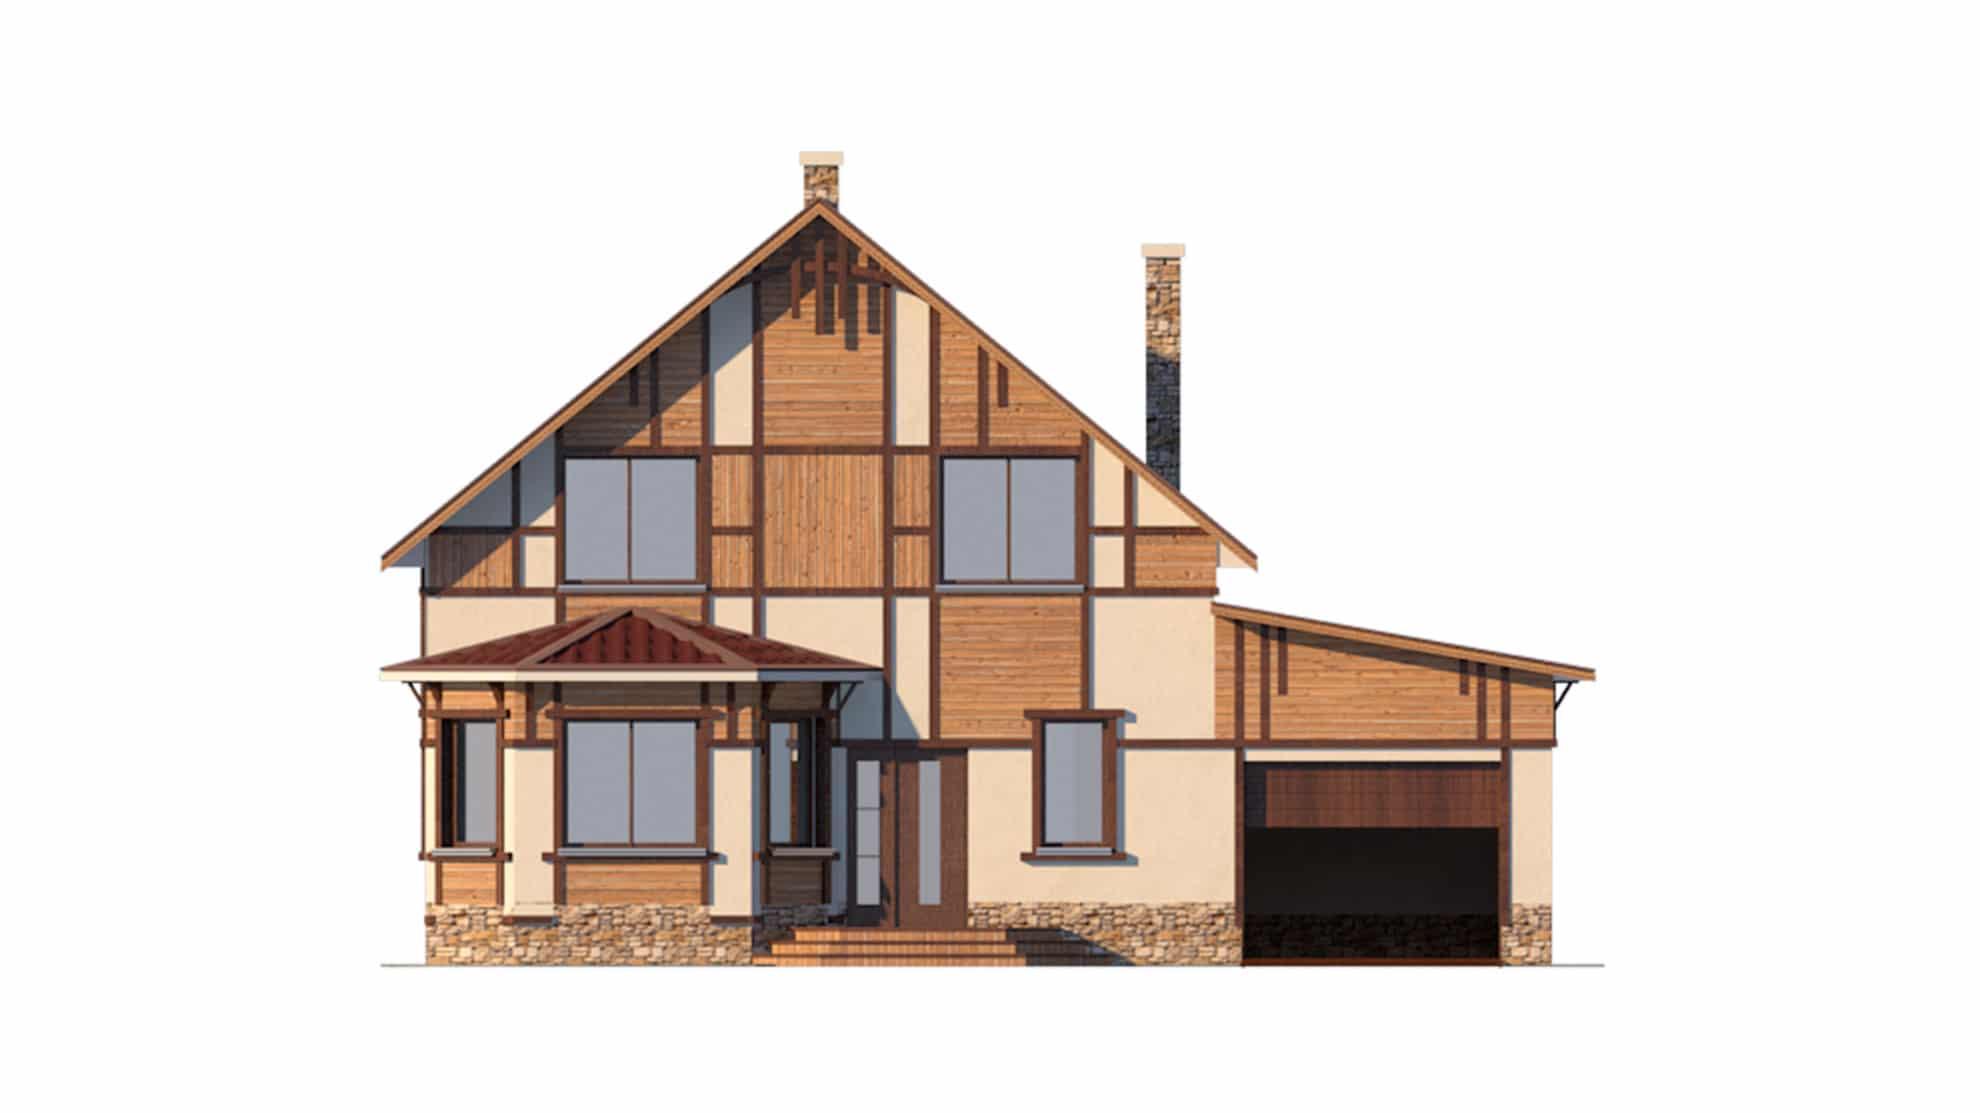 Фасад мансардного дома с гаражом «КМ-34» - спереди